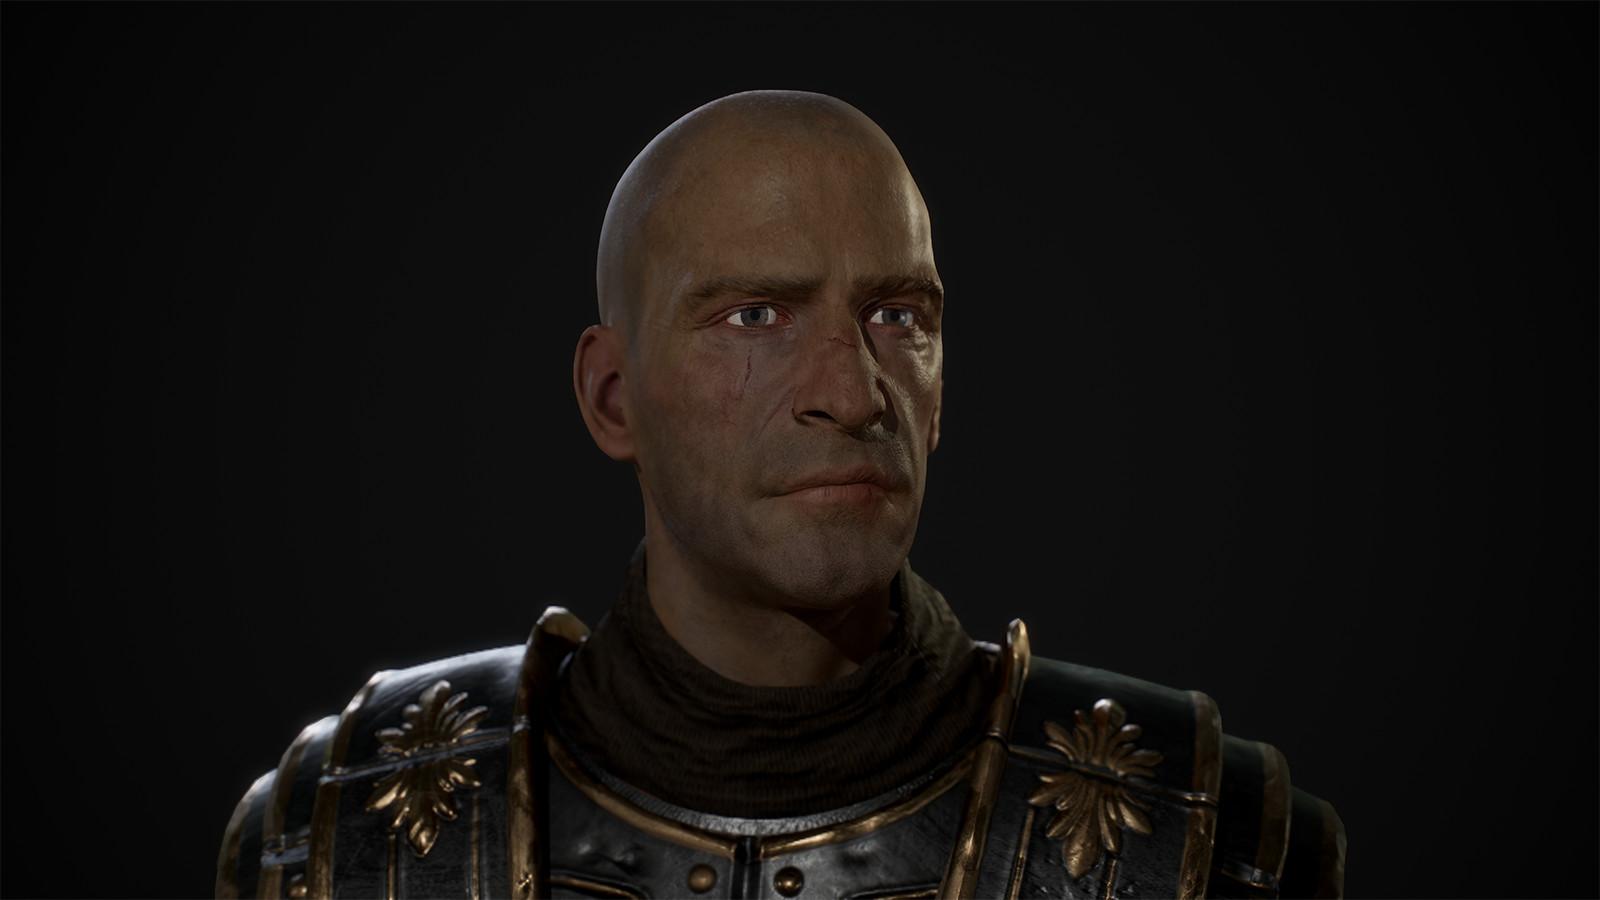 Head Without Helmet